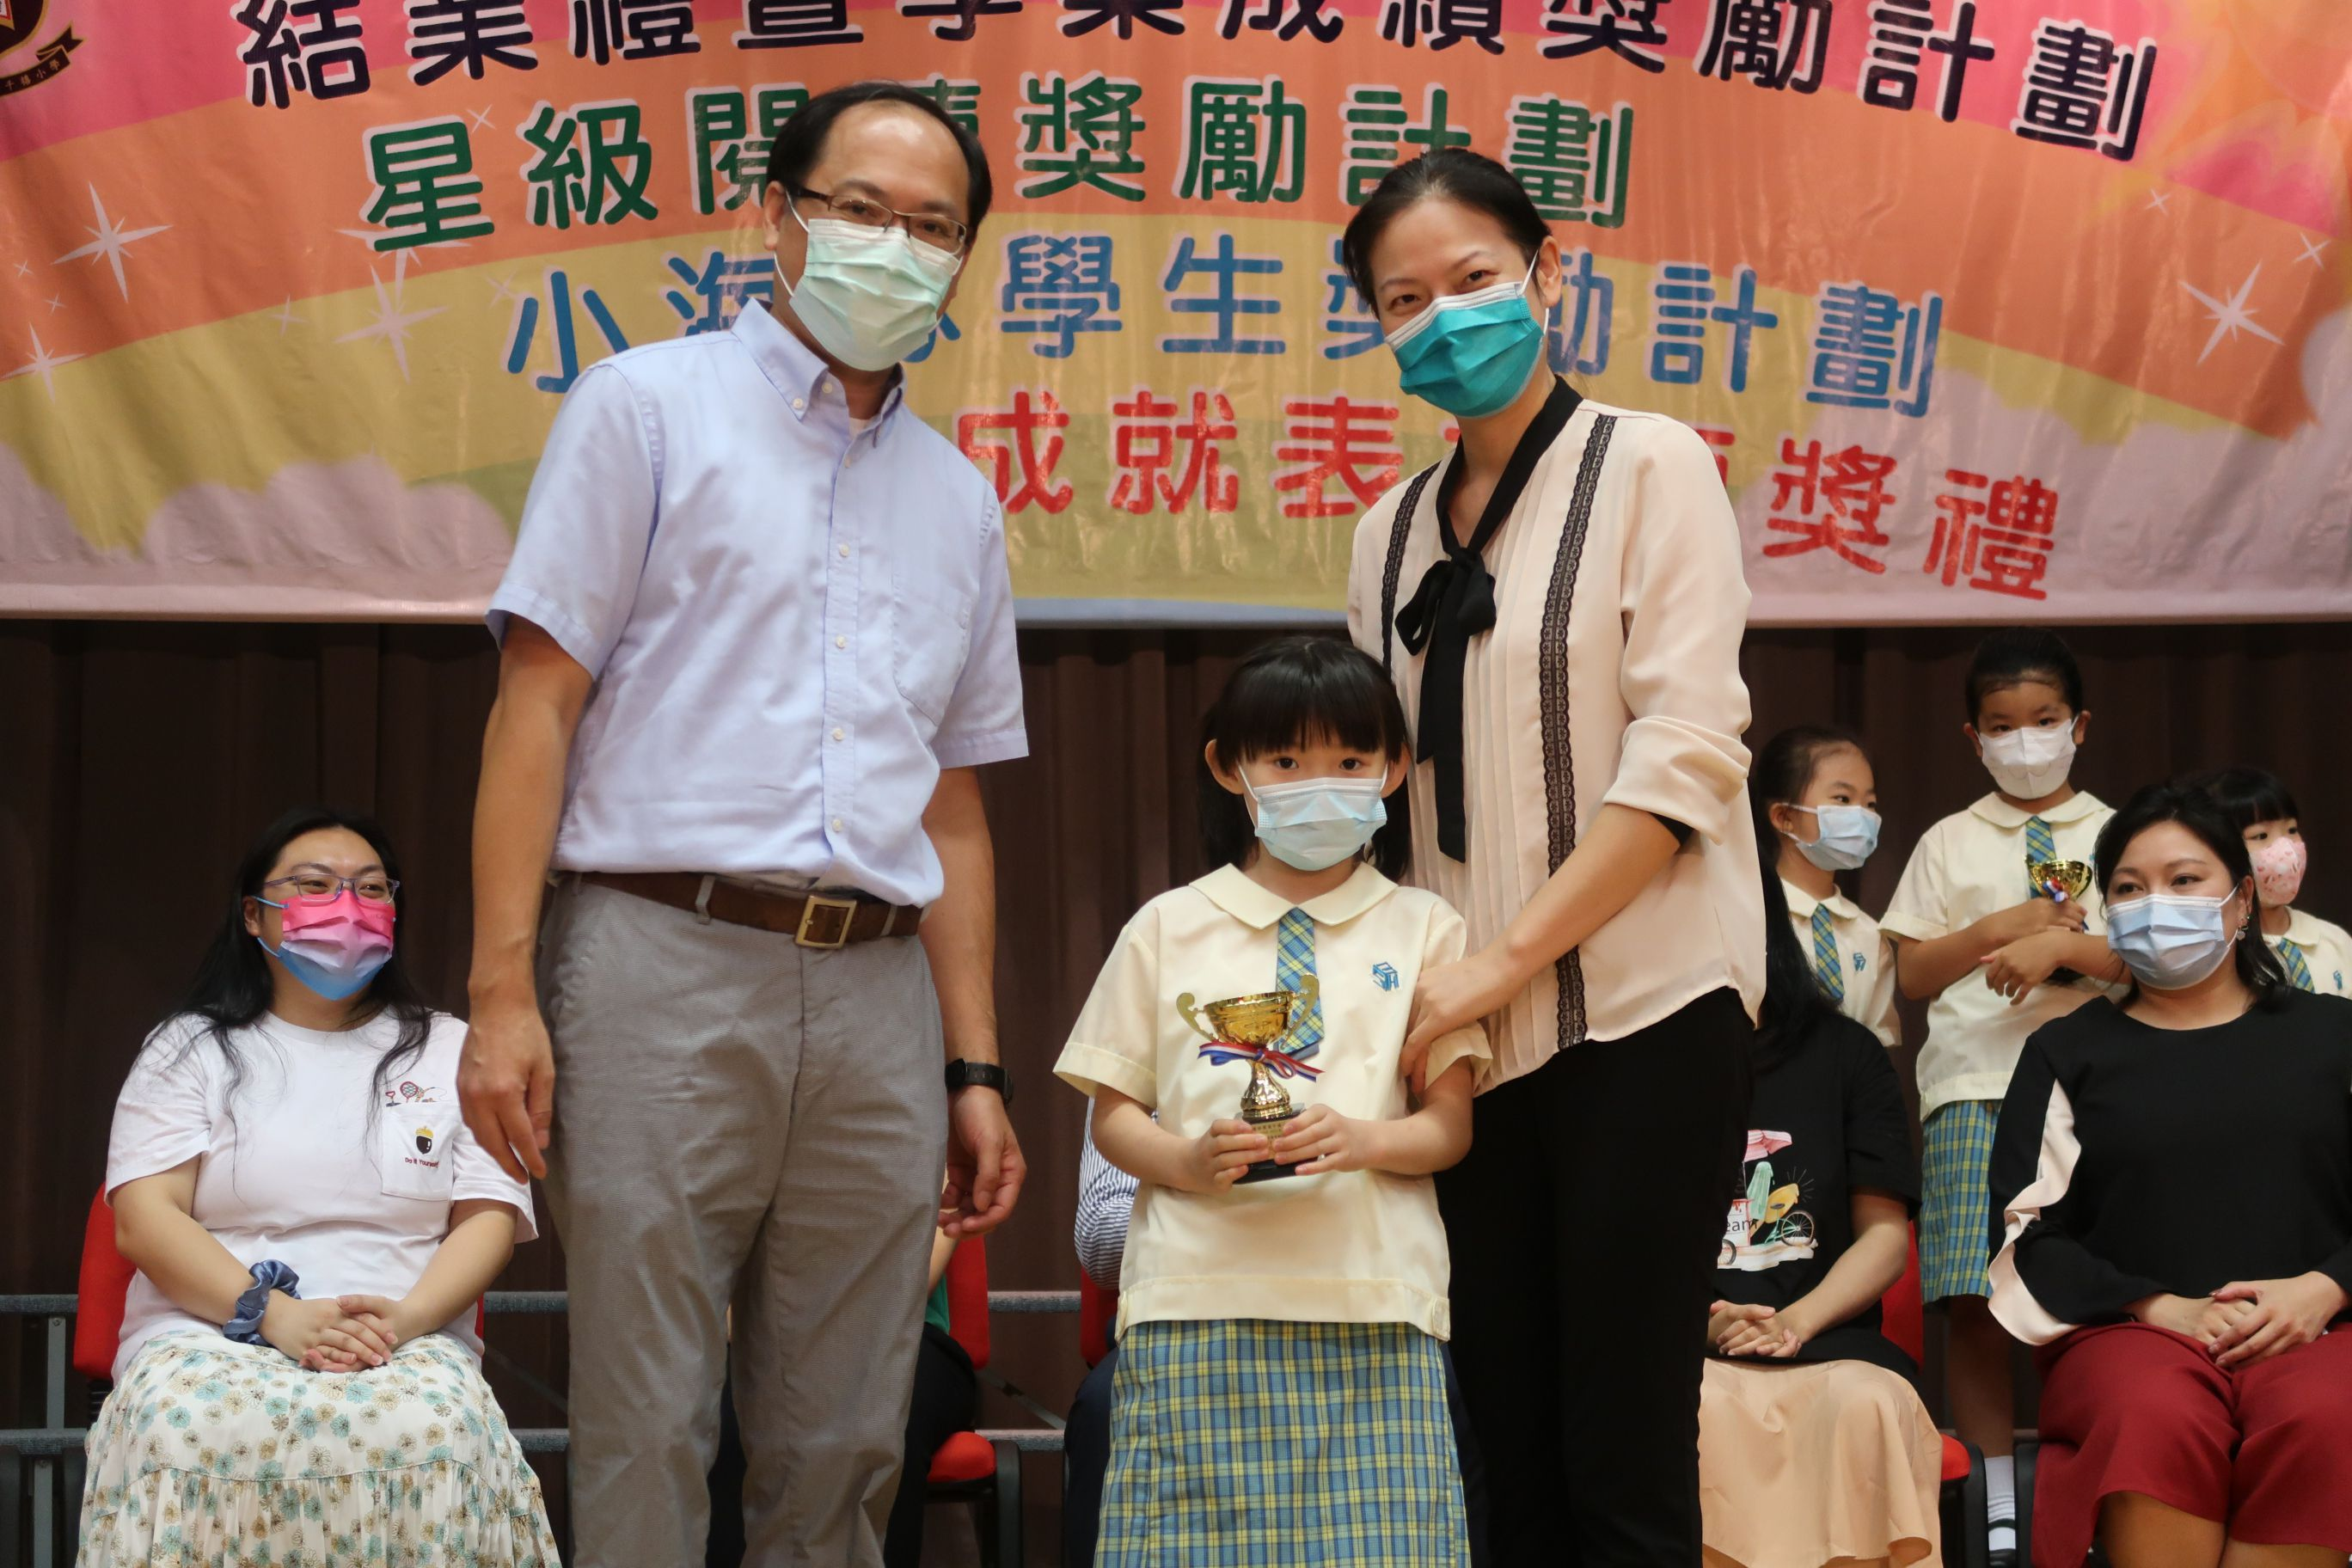 https://syh.edu.hk/sites/default/files/img_5720.jpg